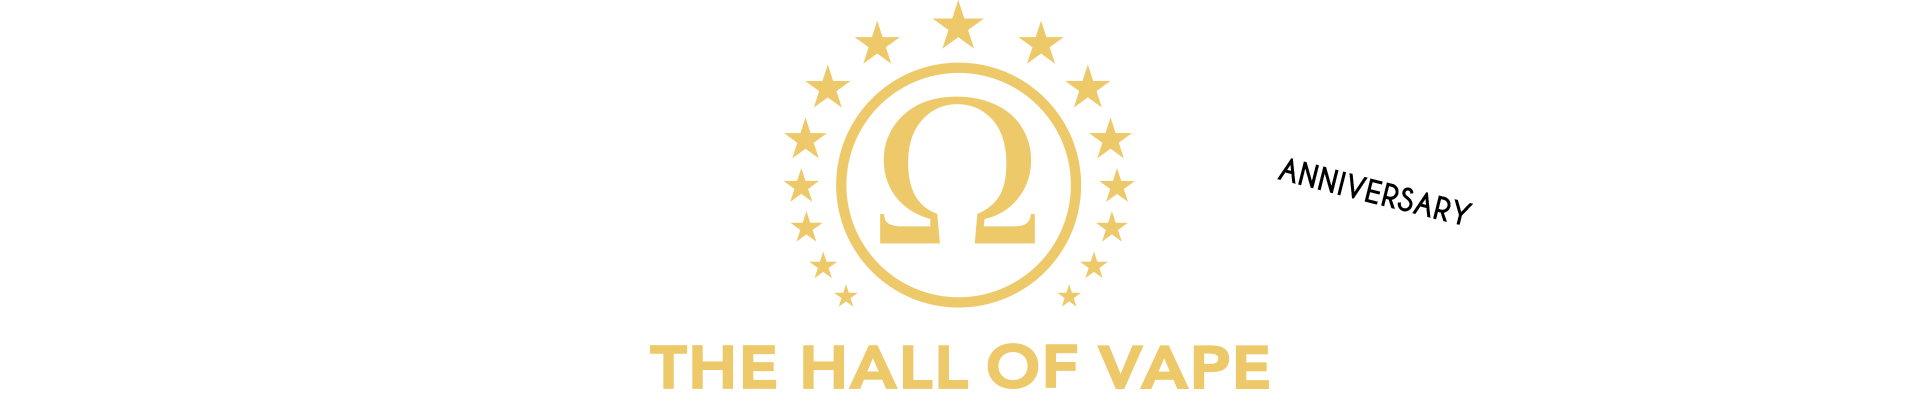 Hall Of Vape